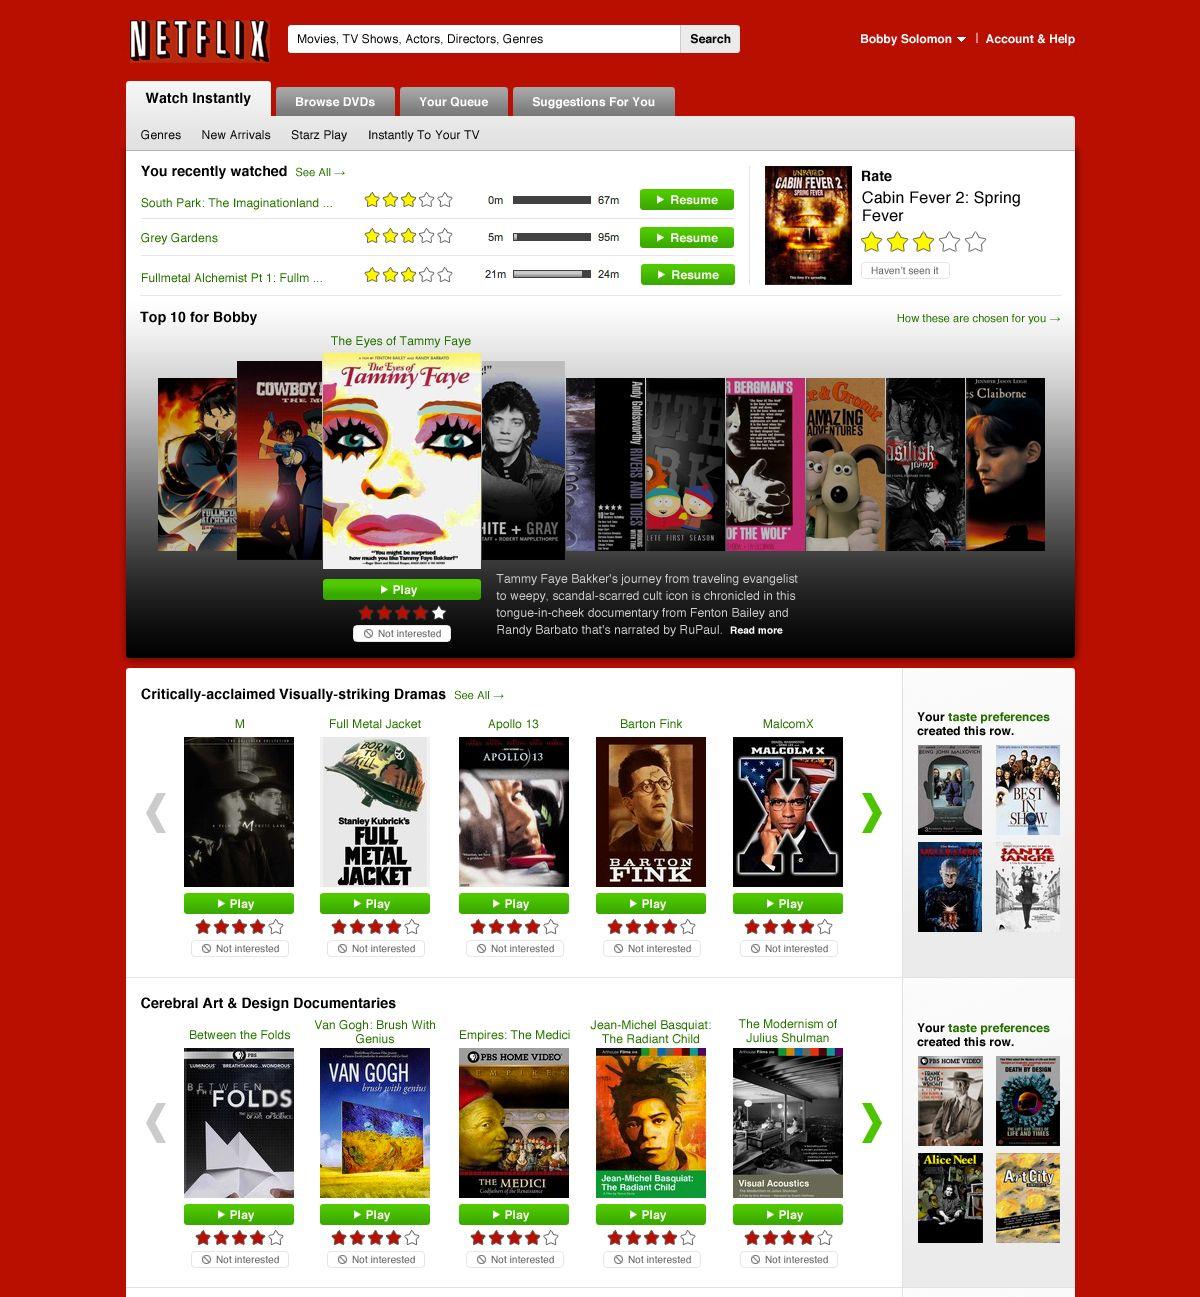 netflix website Netflix website, Netflix movies, Netflix